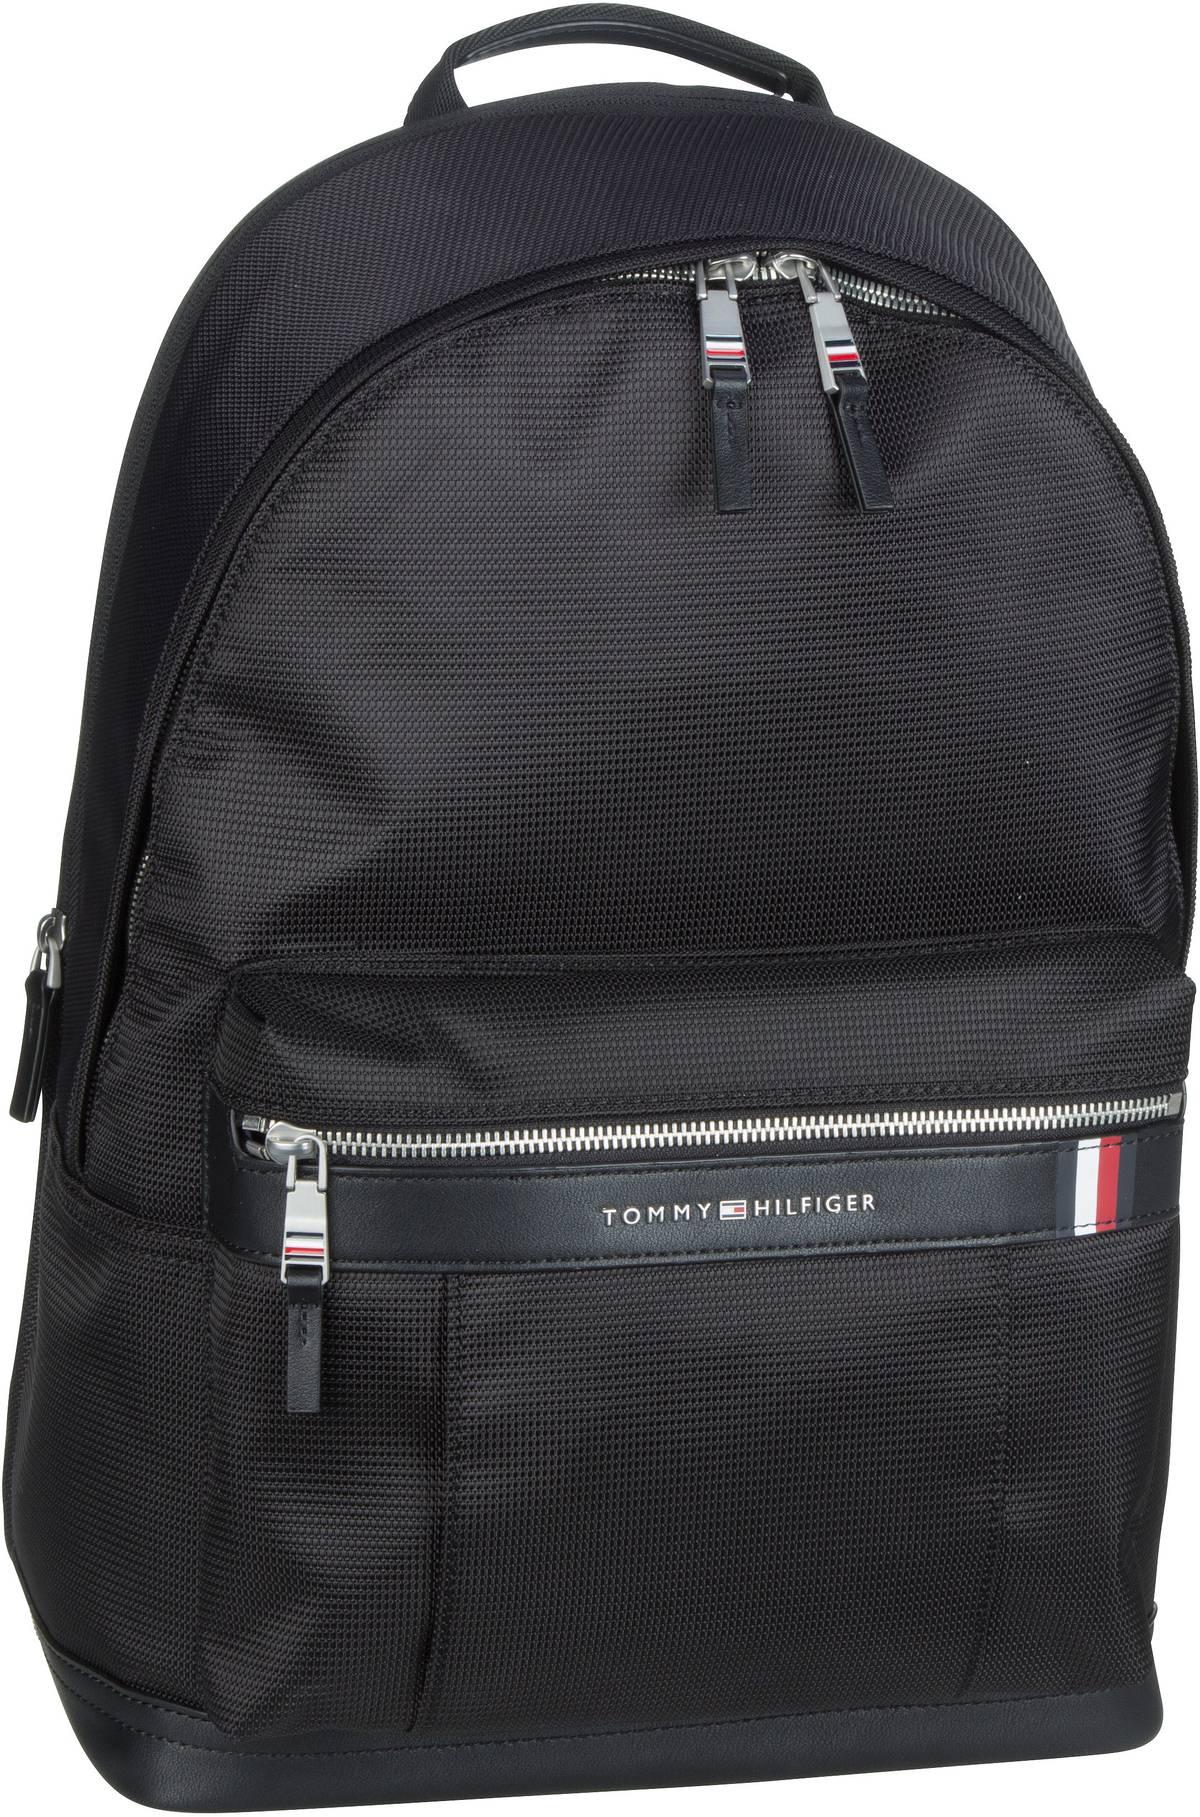 Rucksack / Daypack Elevated Nylon Backpack SP20 Black